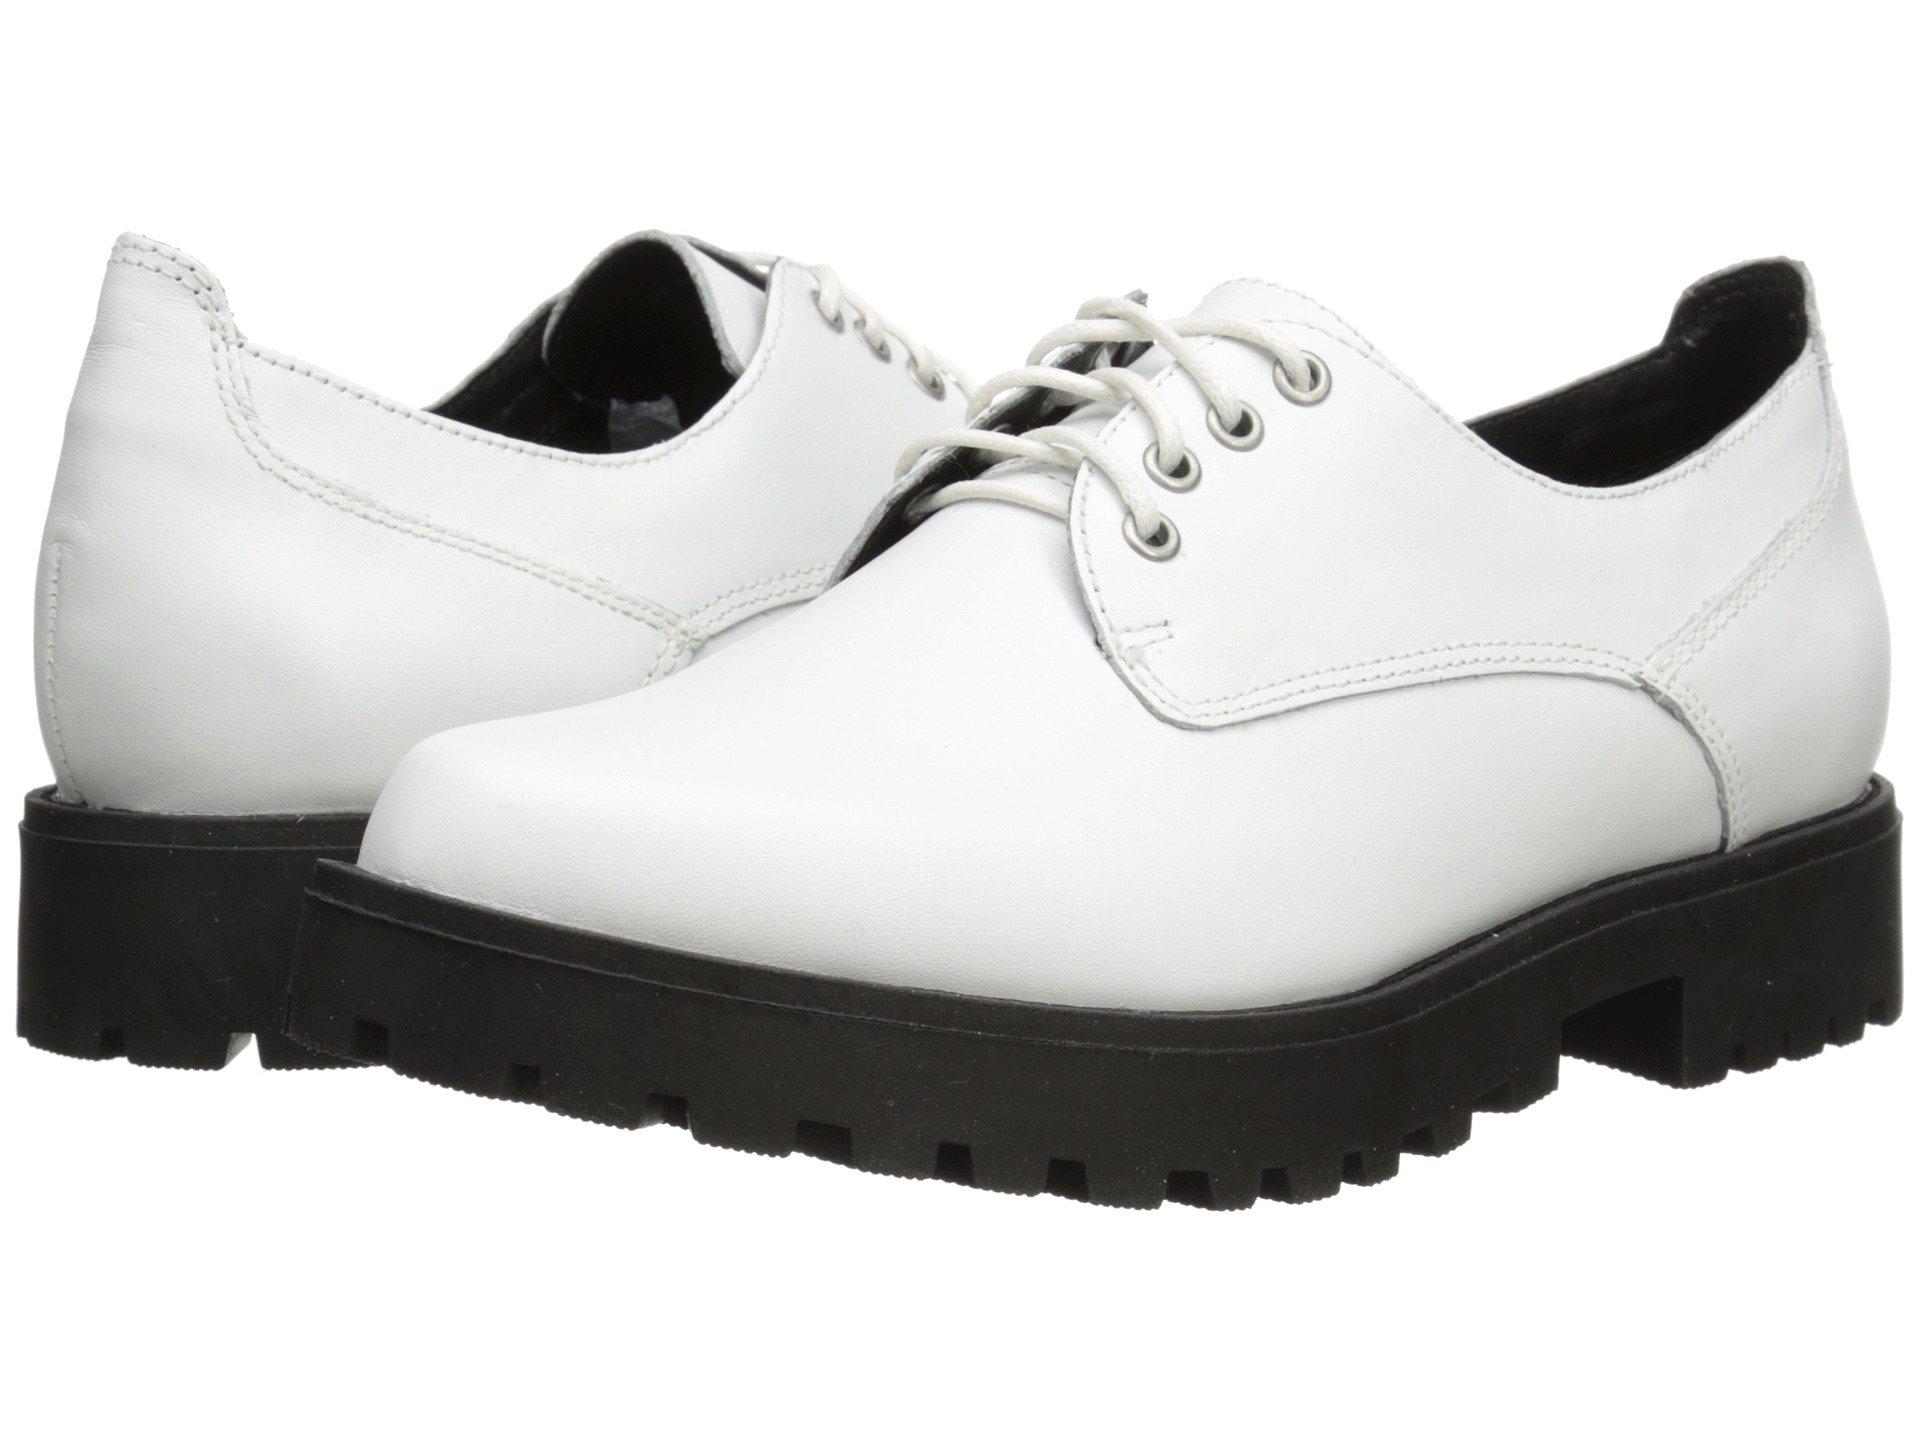 Zapato Casual para Mujer Steve Madden Dewwars  + Steve Madden en VeoyCompro.net